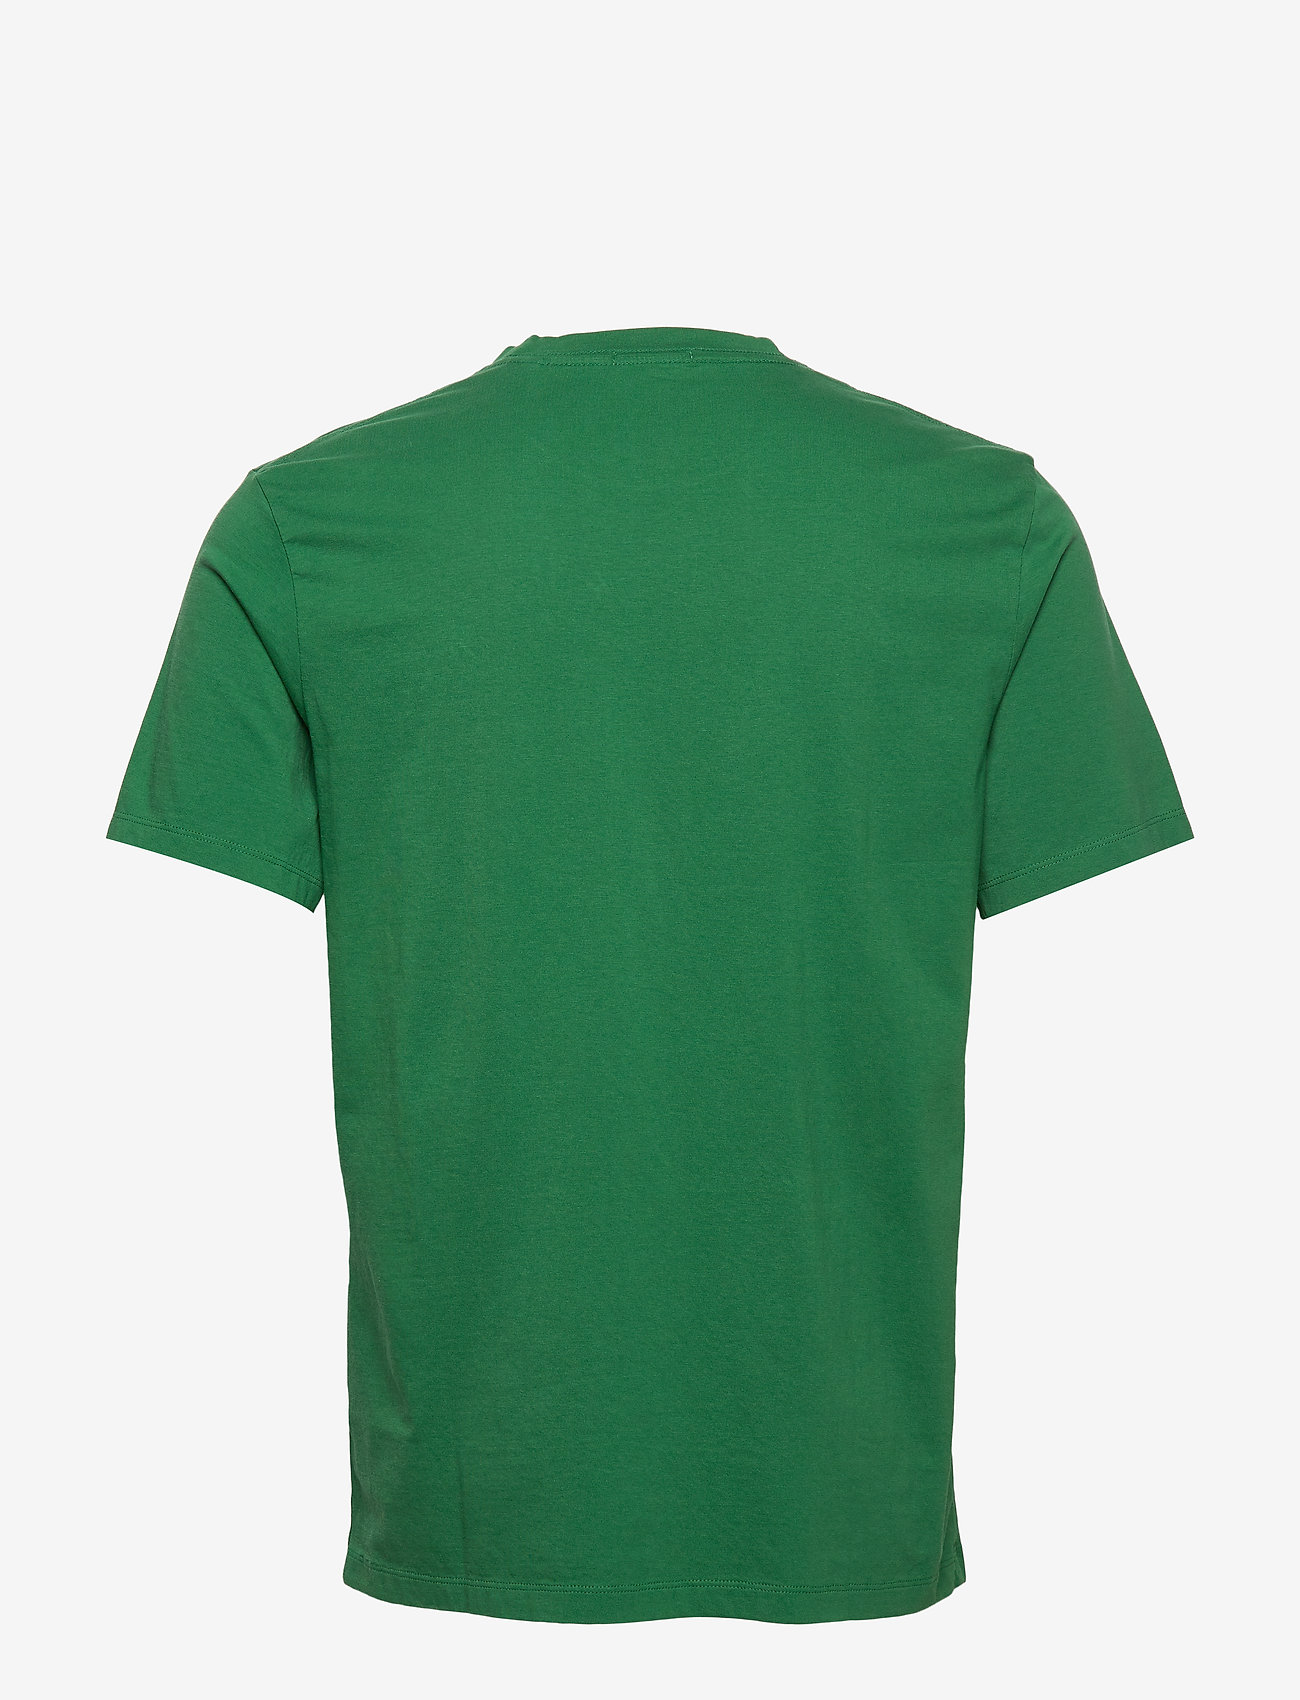 Scotch & Soda - Classic crewneck tee in organic cotton jersey - basic t-shirts - fern - 1